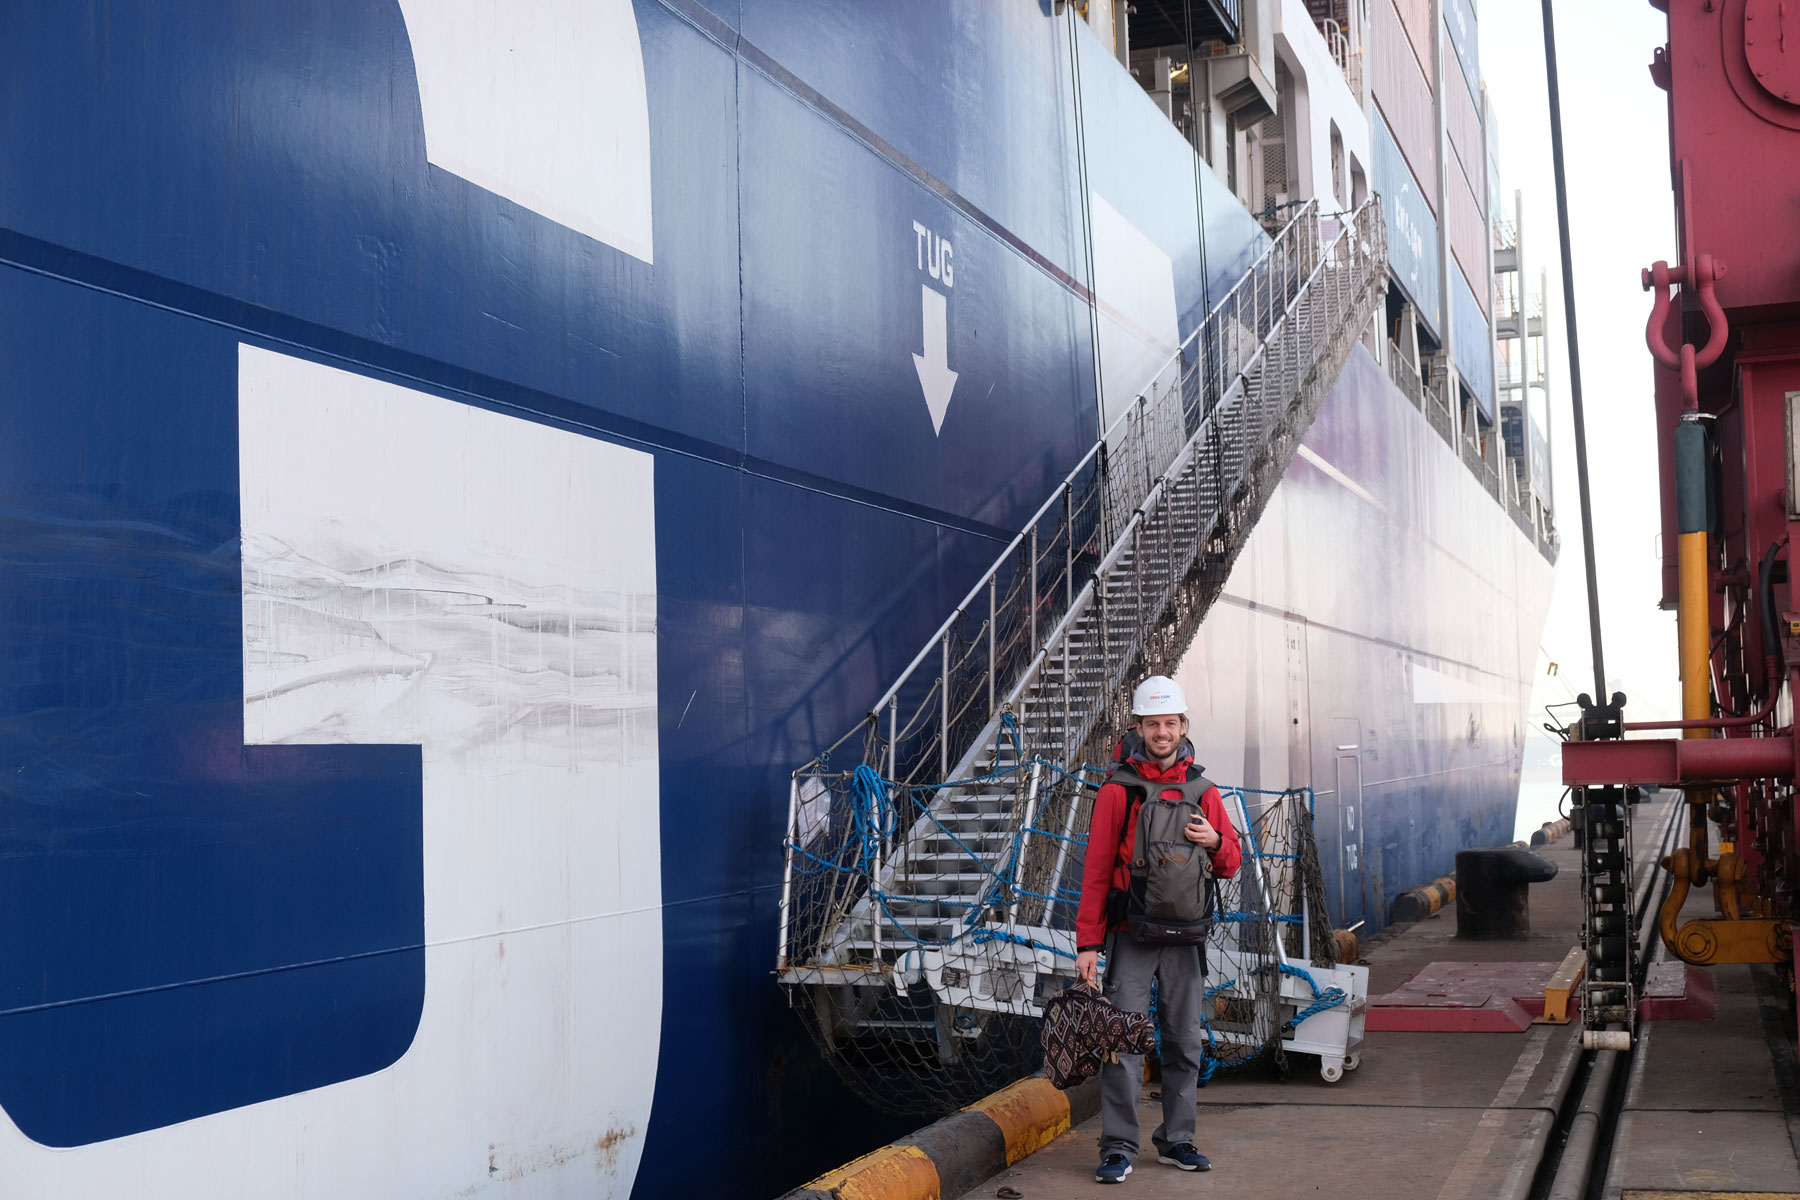 Sebastian an der Gangway der CMA CGM Jacques Jospeh am Hafen von Qingdao.